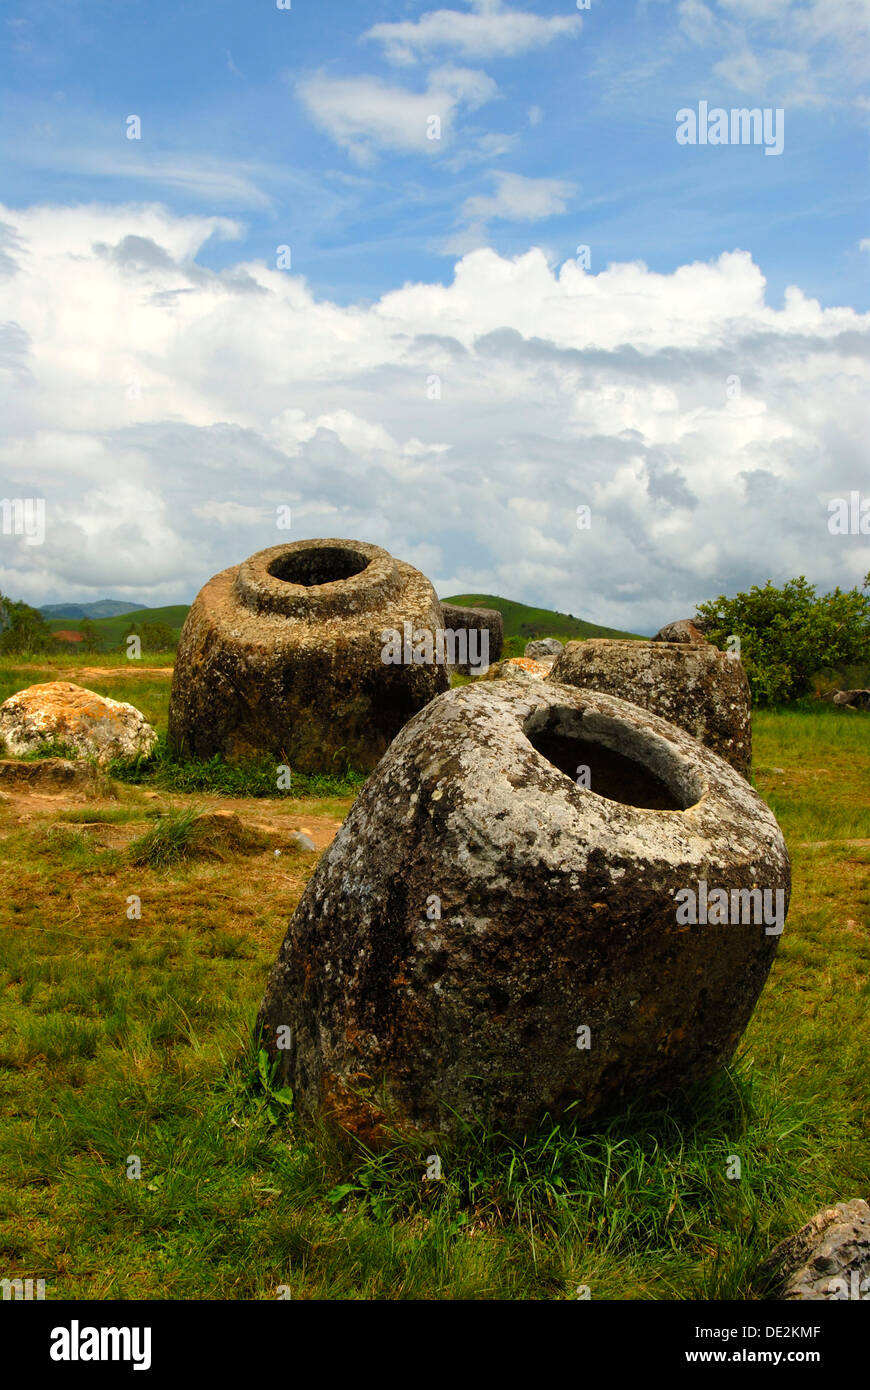 Archeologia, antichi vasi in pietra nel paesaggio, Jar sito 1, Hai Hin Phu Salato, Pianura di vasi, vicino a Phonsavan Foto Stock